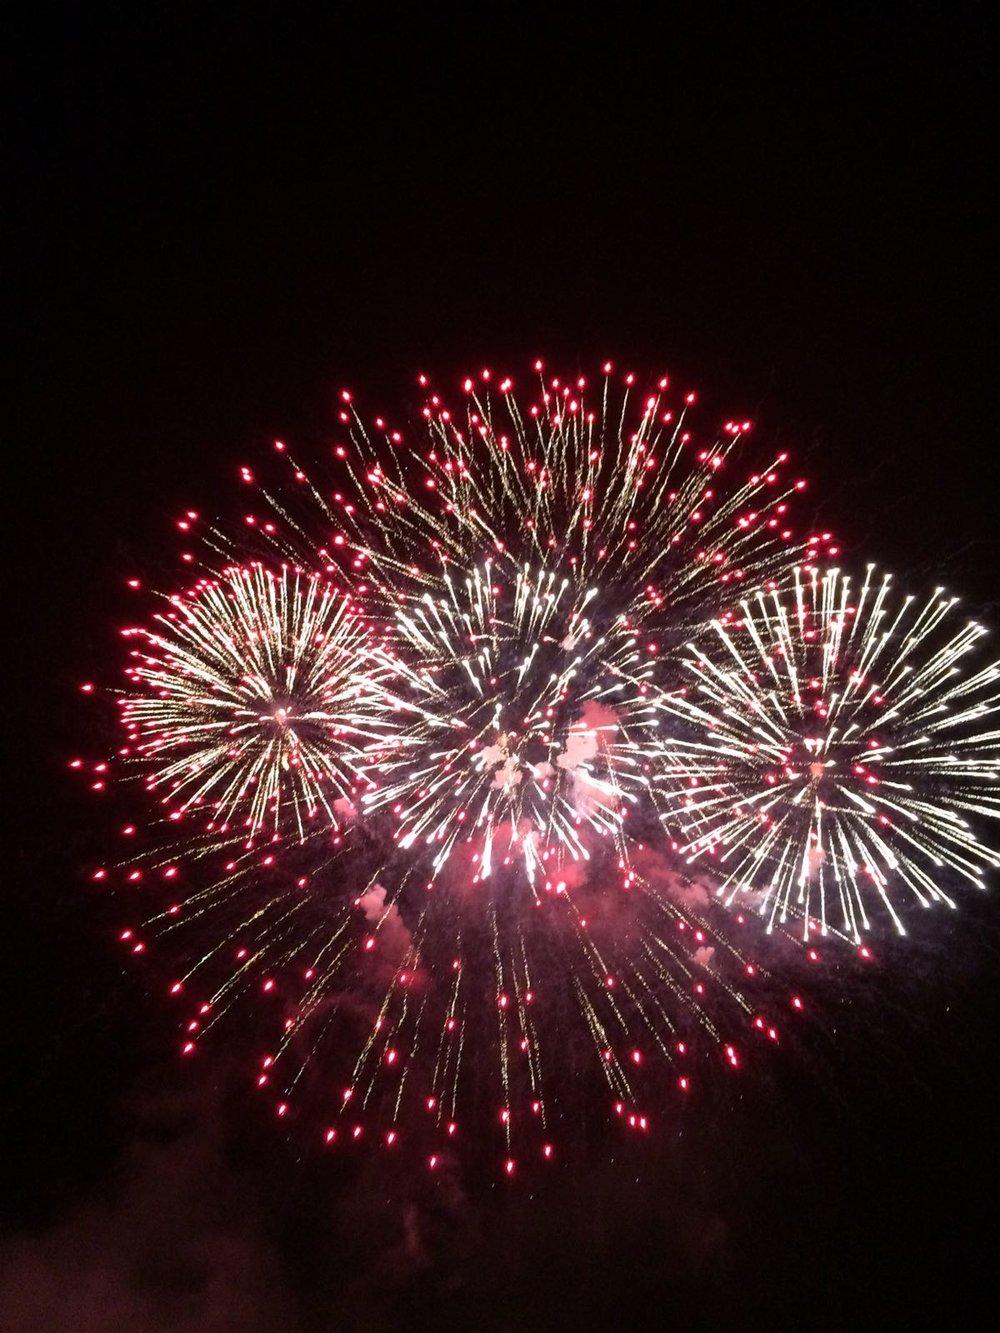 Fireworks Aker Brygge